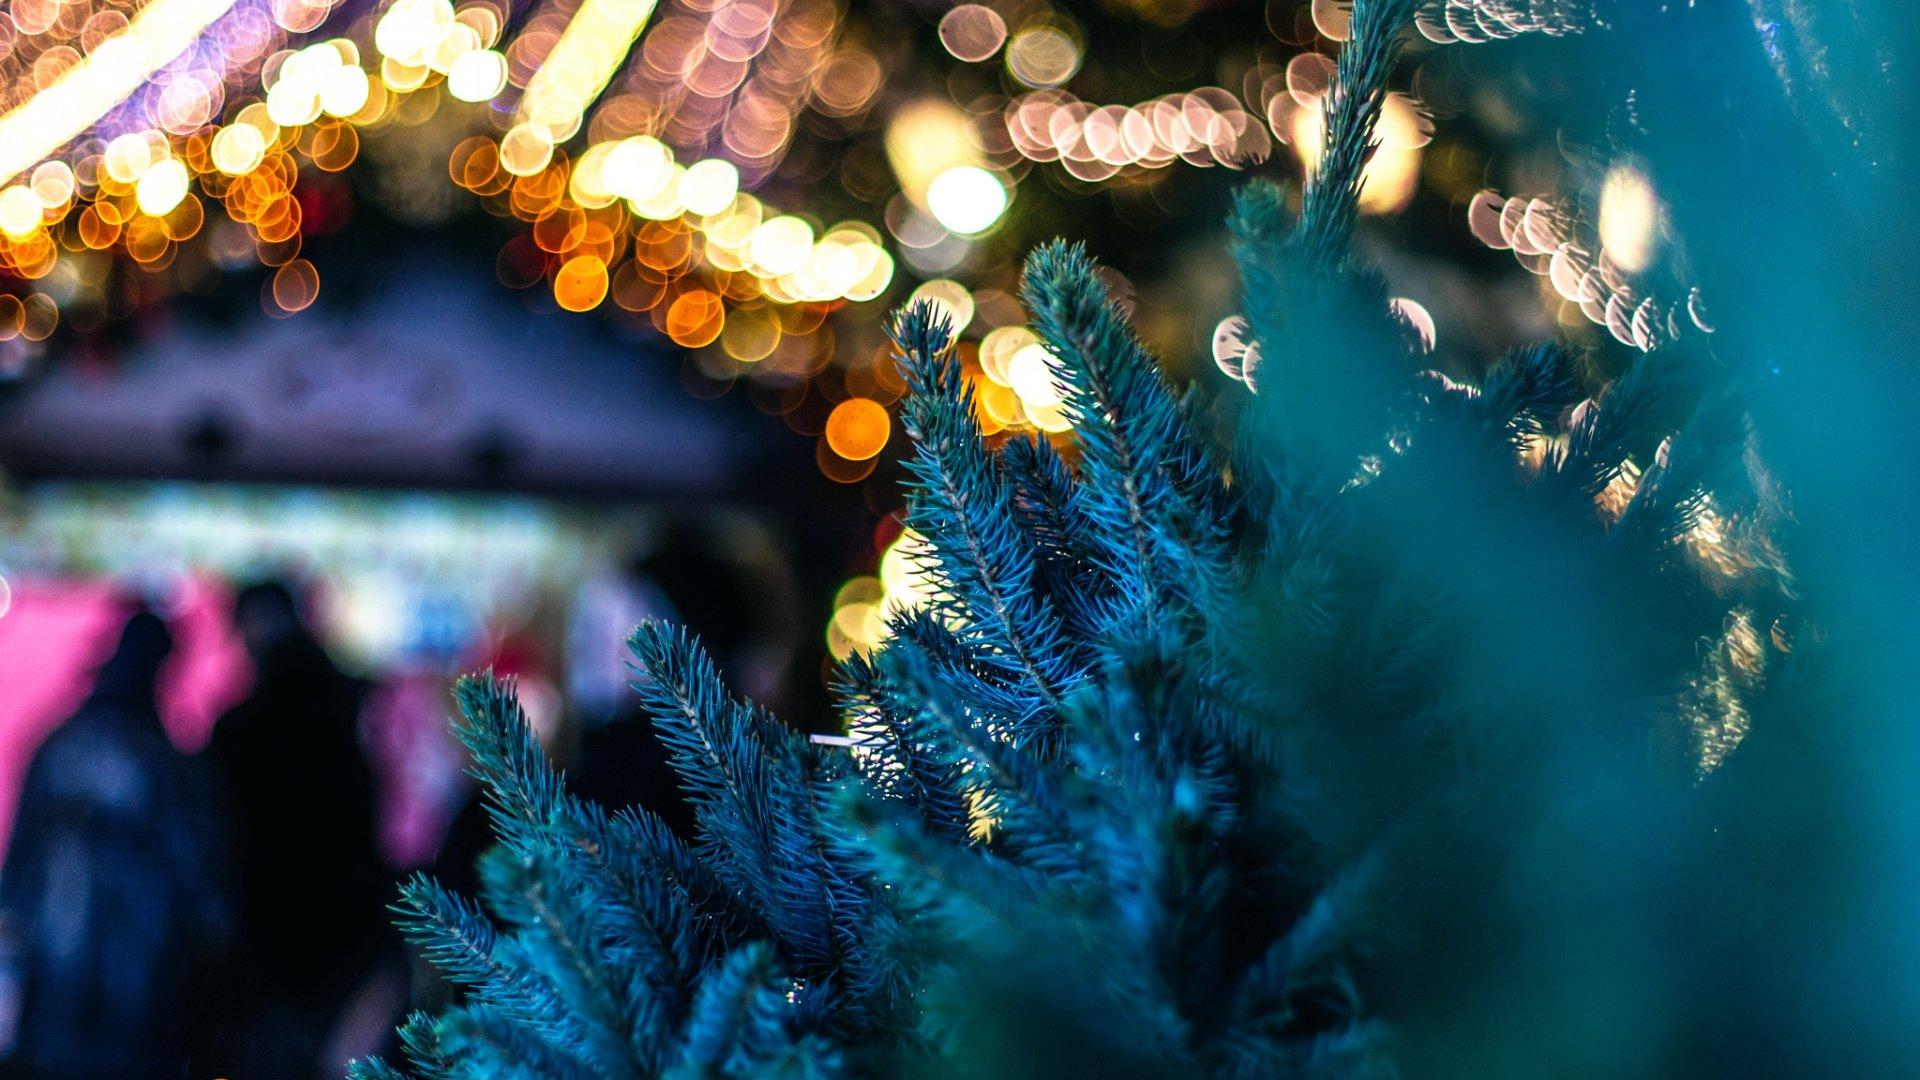 Aesthetic Christmas Background HD